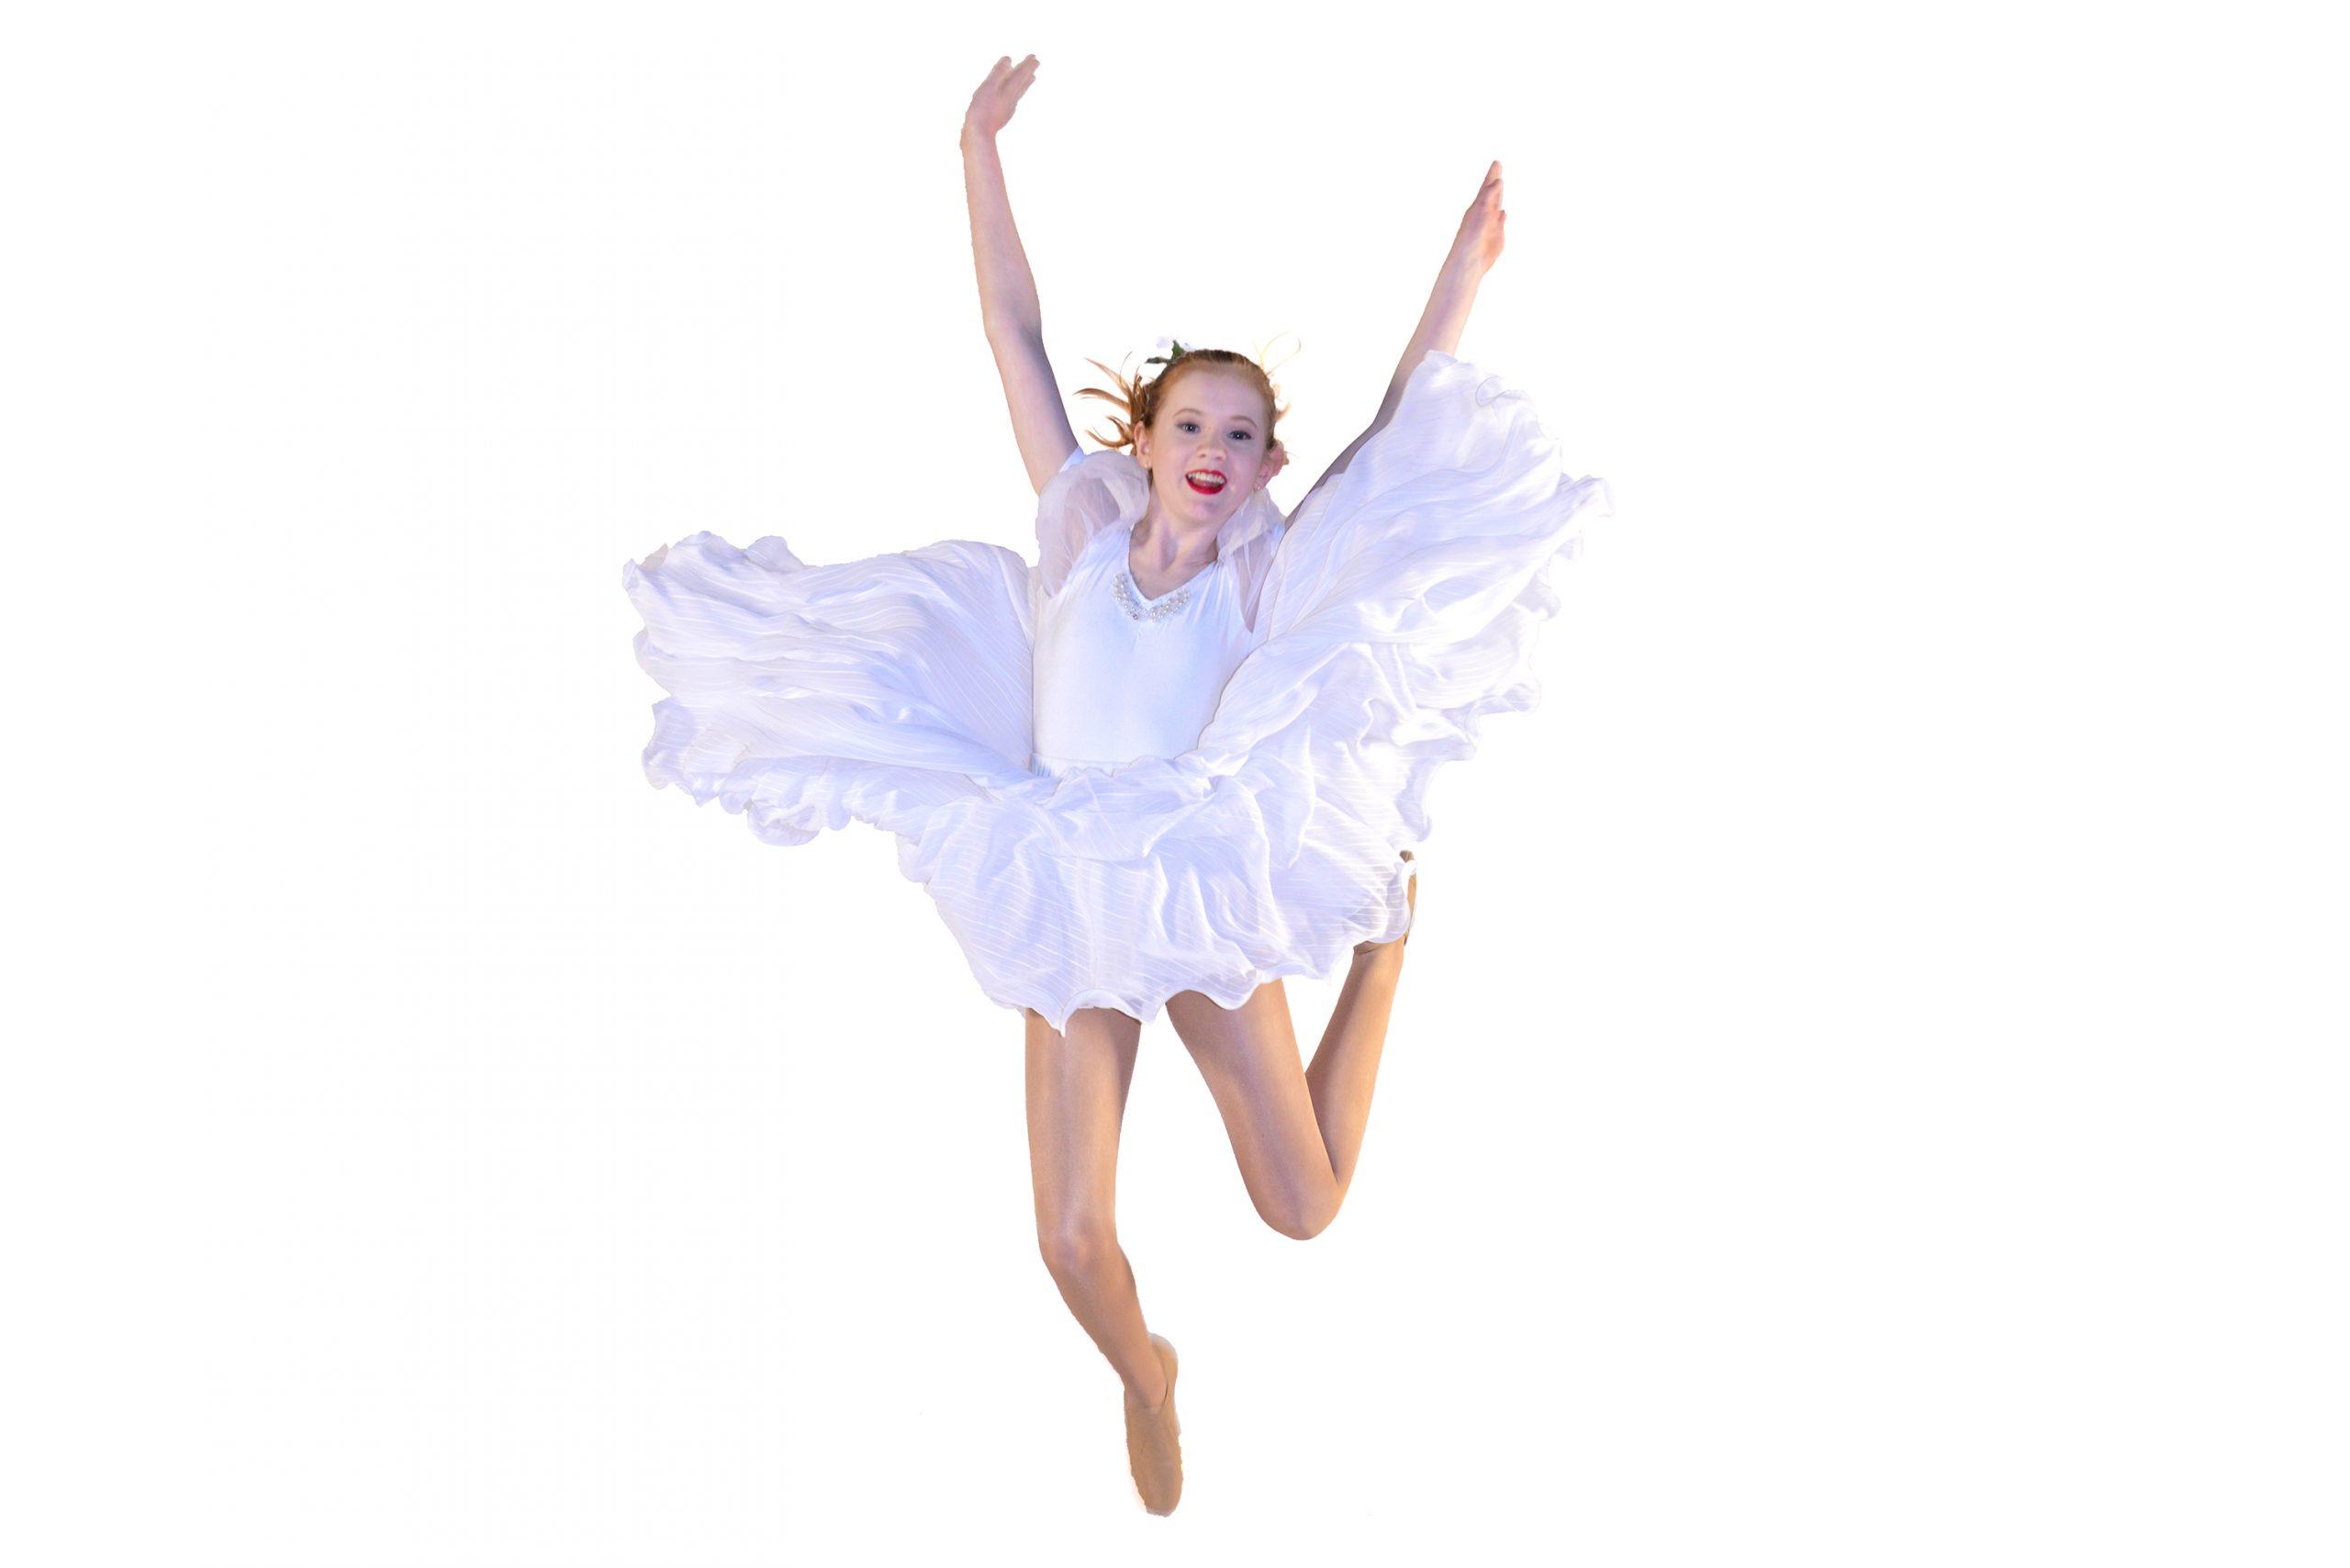 Diakosmos_Dance_Academy_Core_value_Celebrate_Achievements